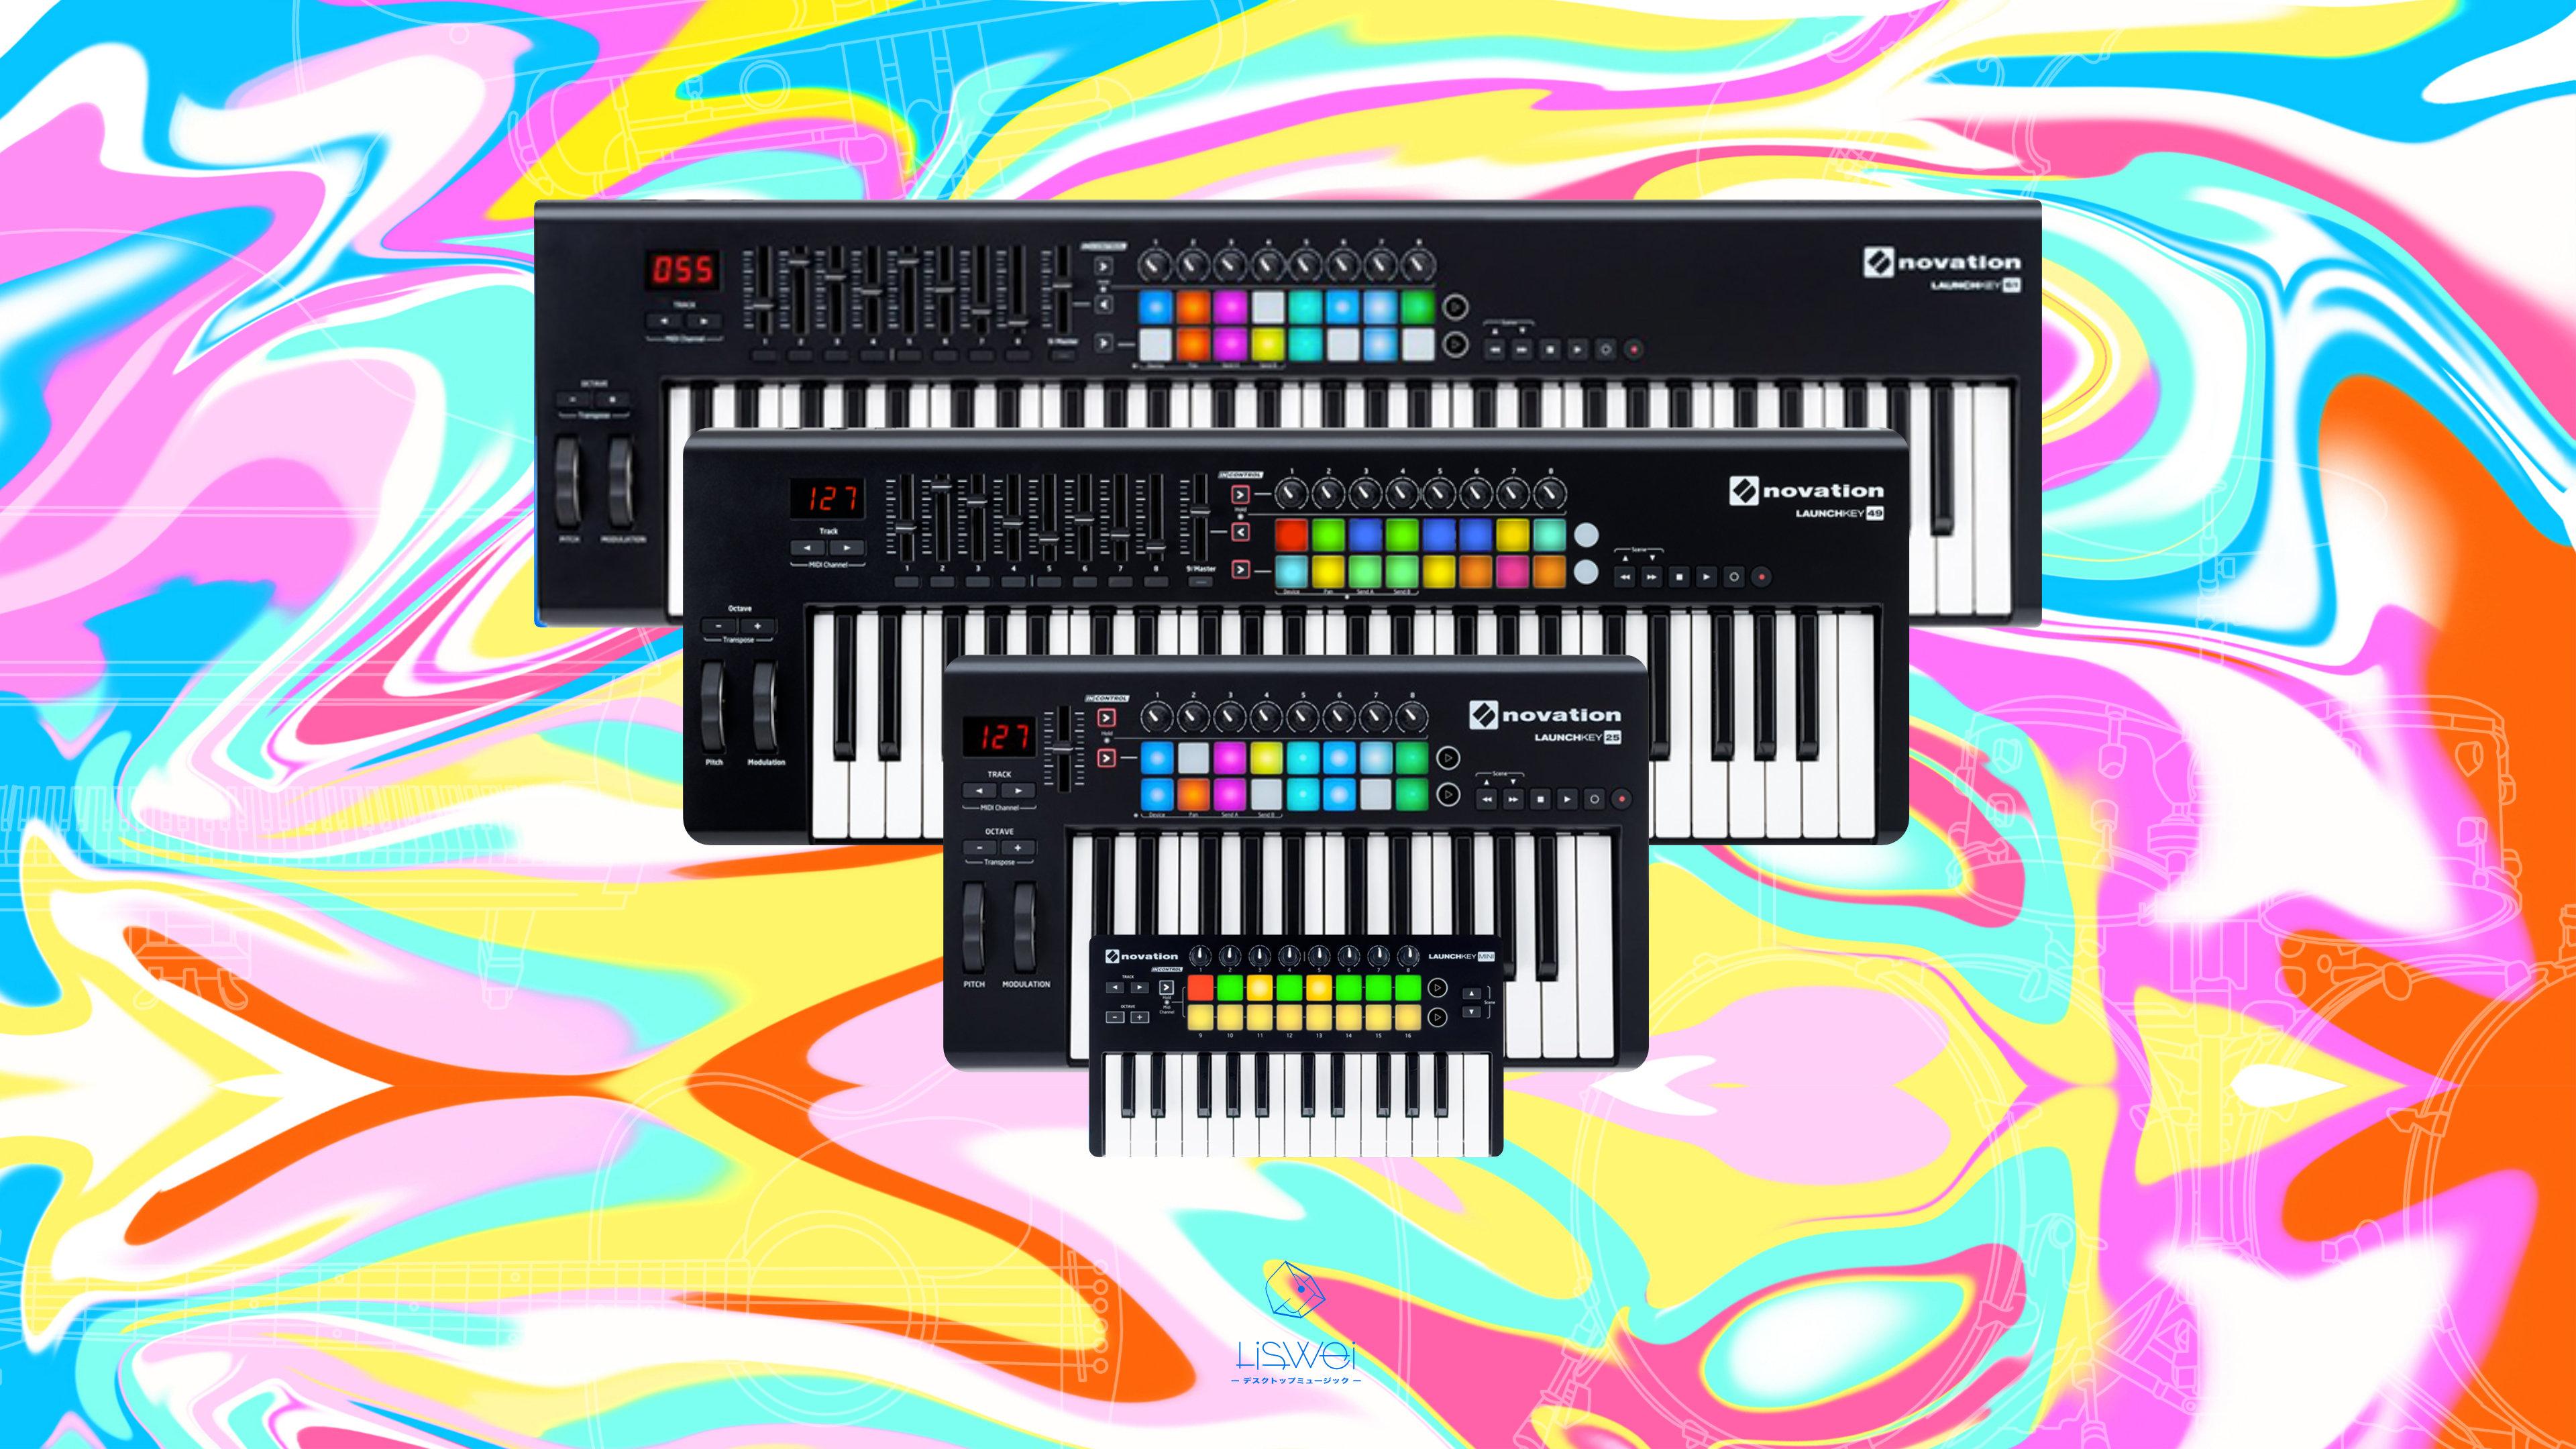 Novation Launchkey 系列 MIDI 鍵盤控制器